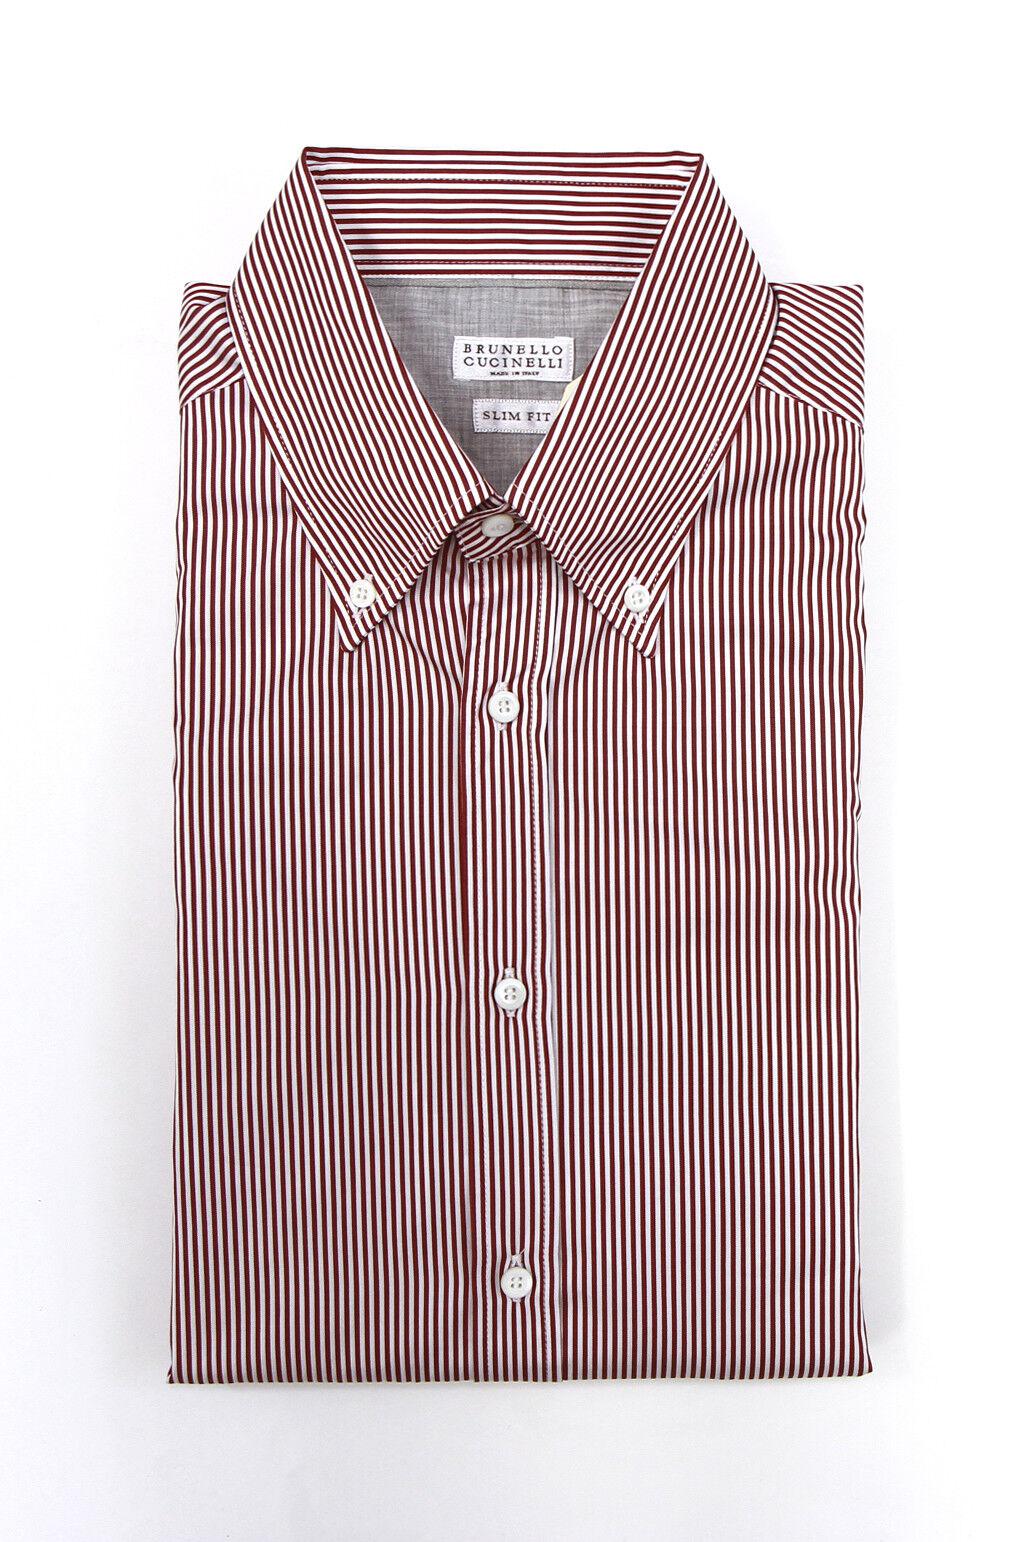 NWT Brunello Cucinelli Mens  Slim Fit  Striped Button-Down Dress Shirt Sz M A181